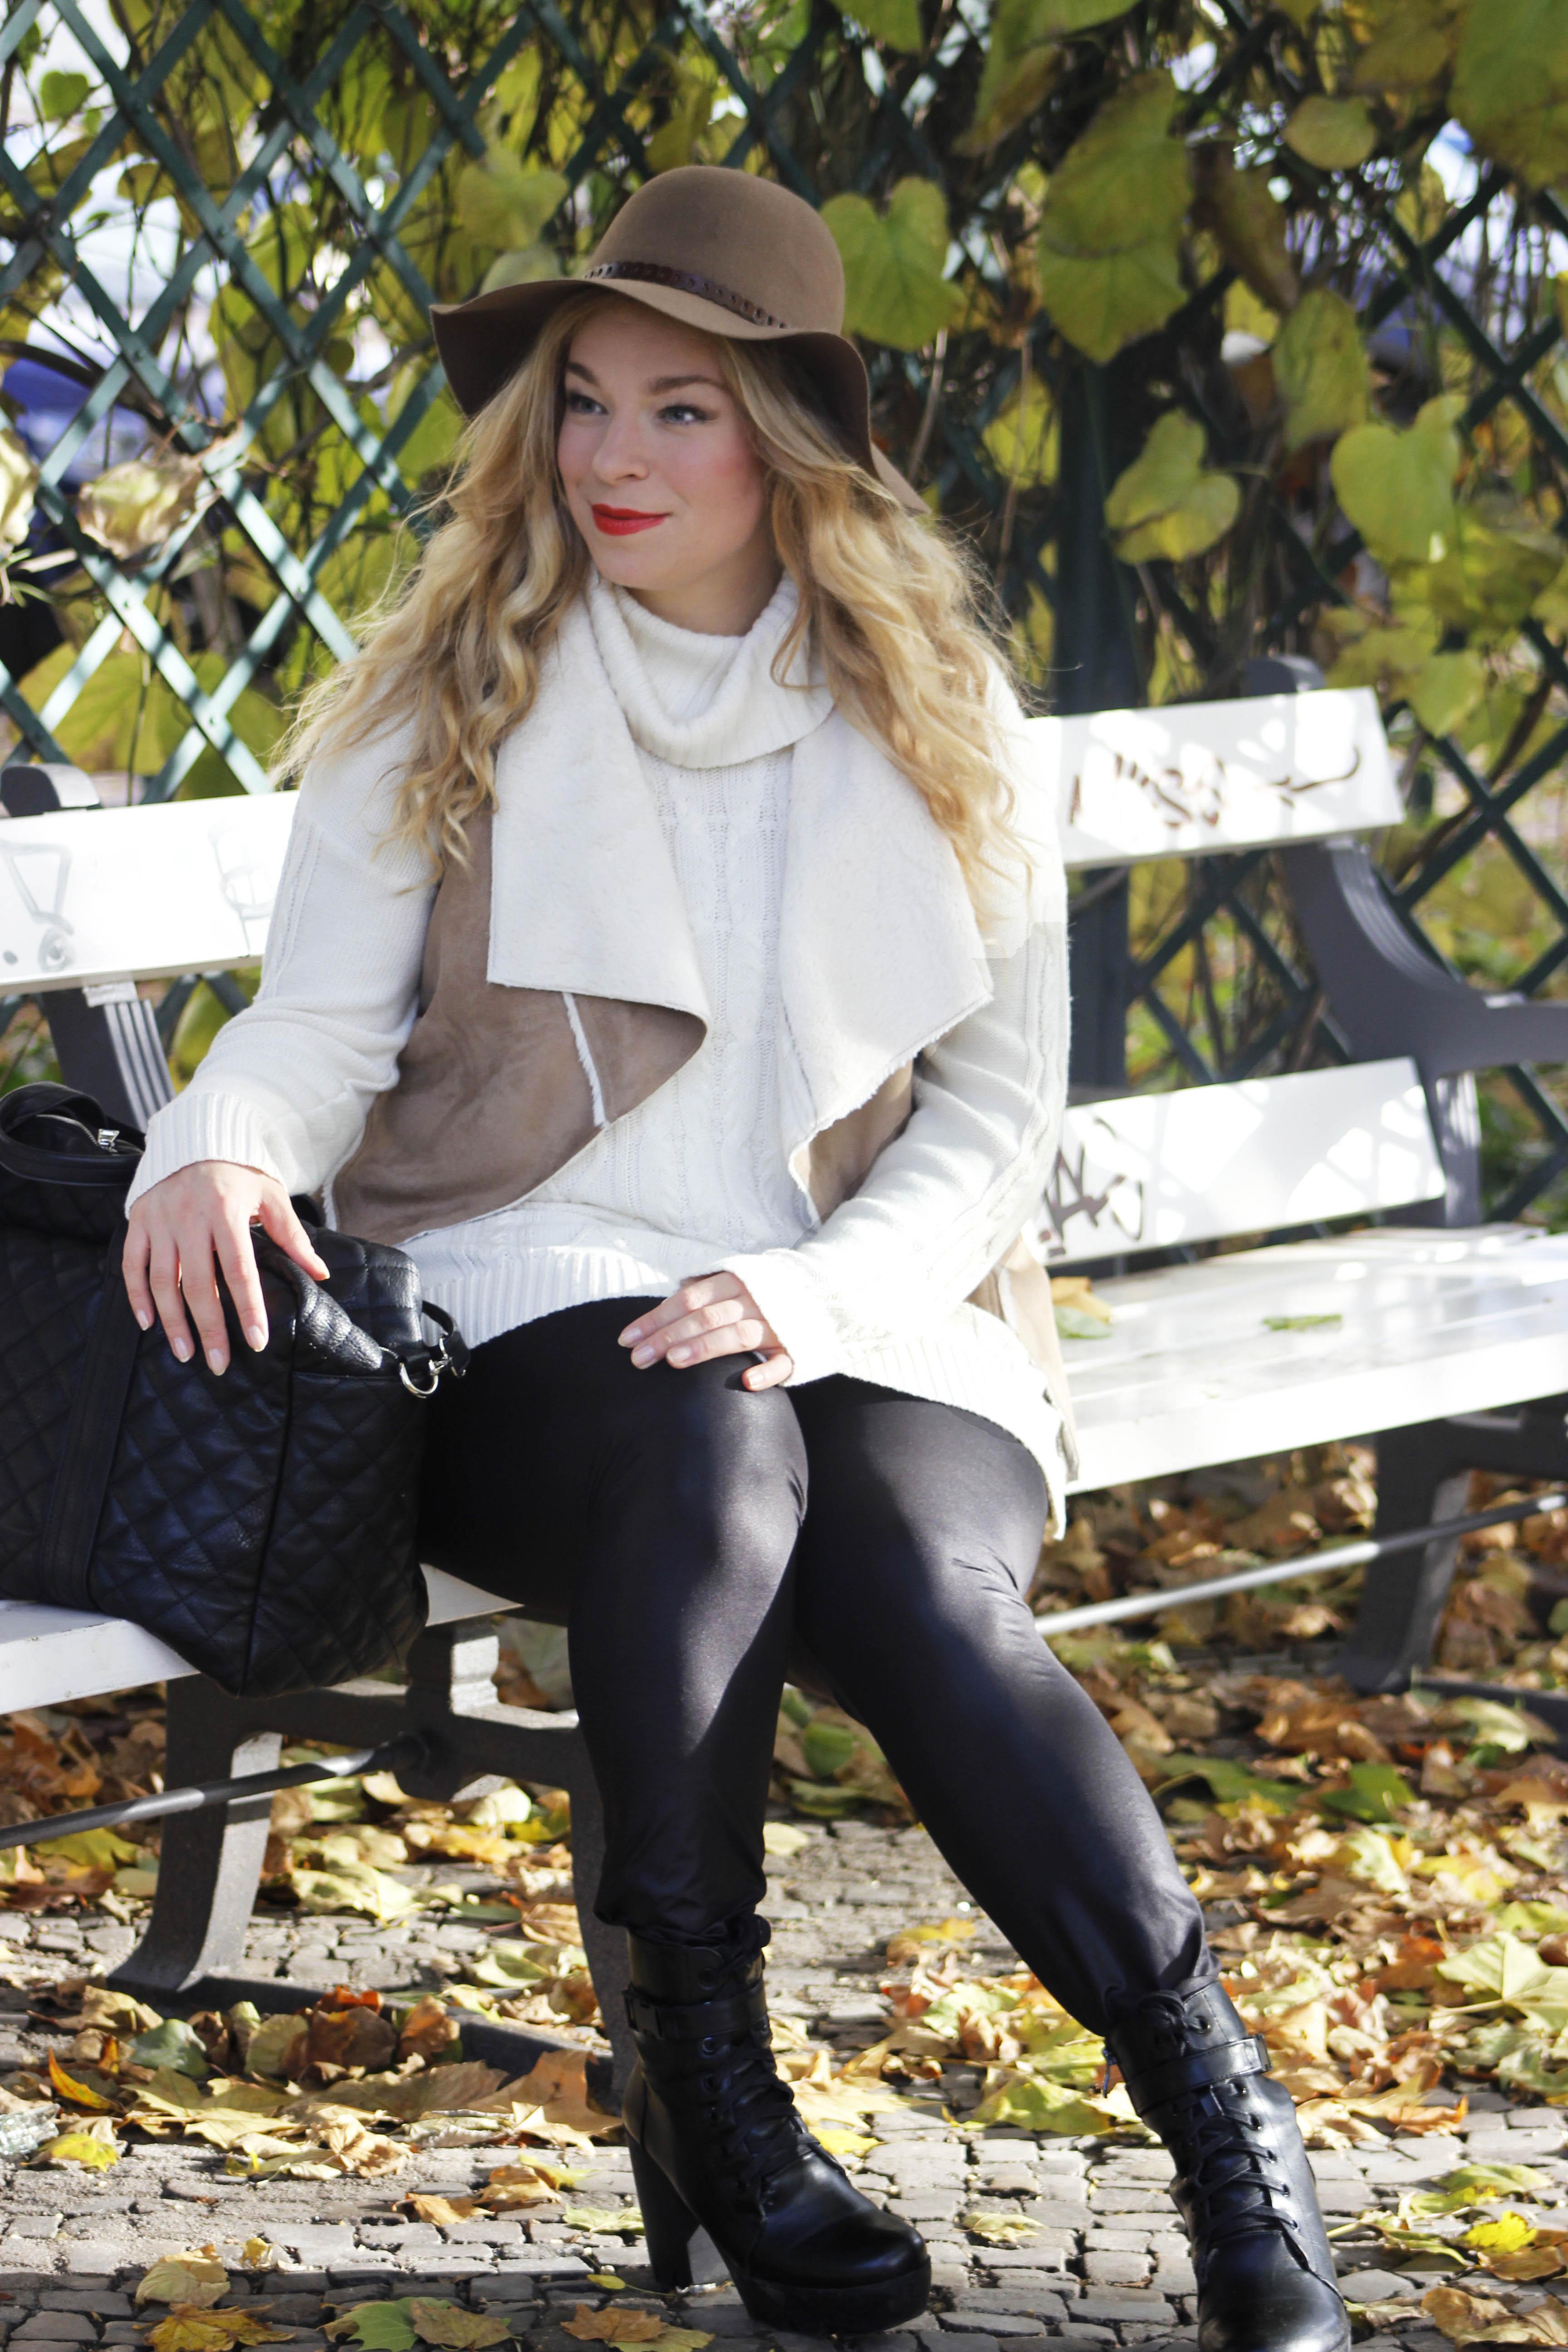 Junarose-Outfit-Plus-size-caterina-pogorzelski-Megabambi-curvy-blog